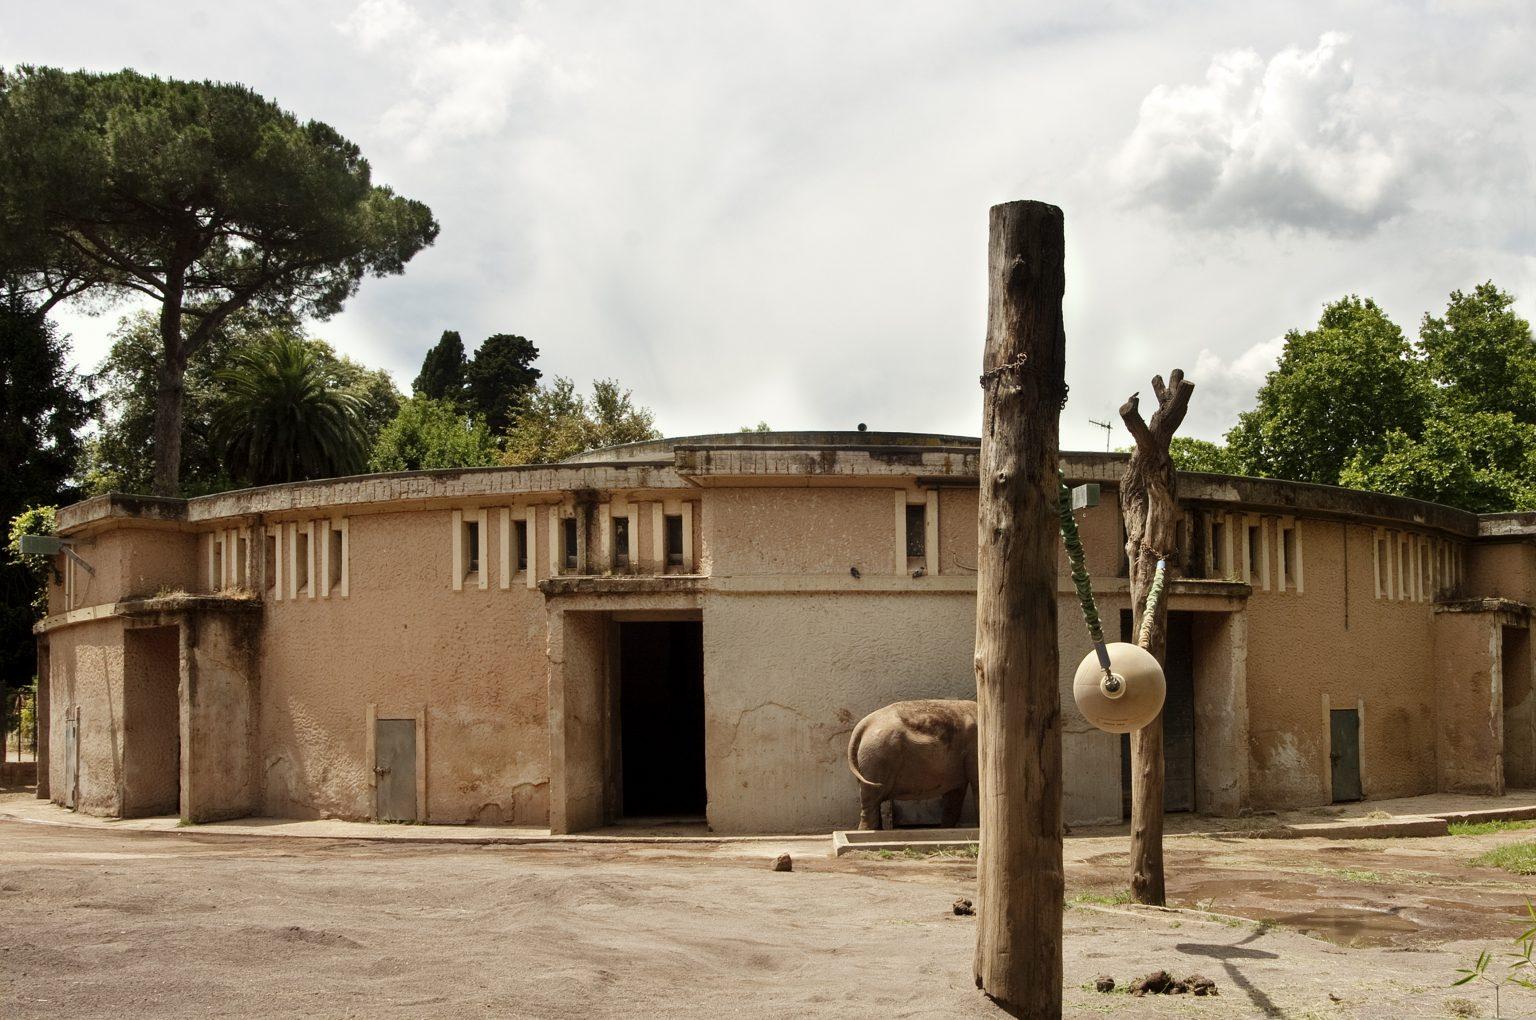 Rome, June 2011 - Bioparco, zoological garden, Asian elephant. >< Roma, giugno 2011 - Bioparco, giardino zoologico, elefante asiatico.